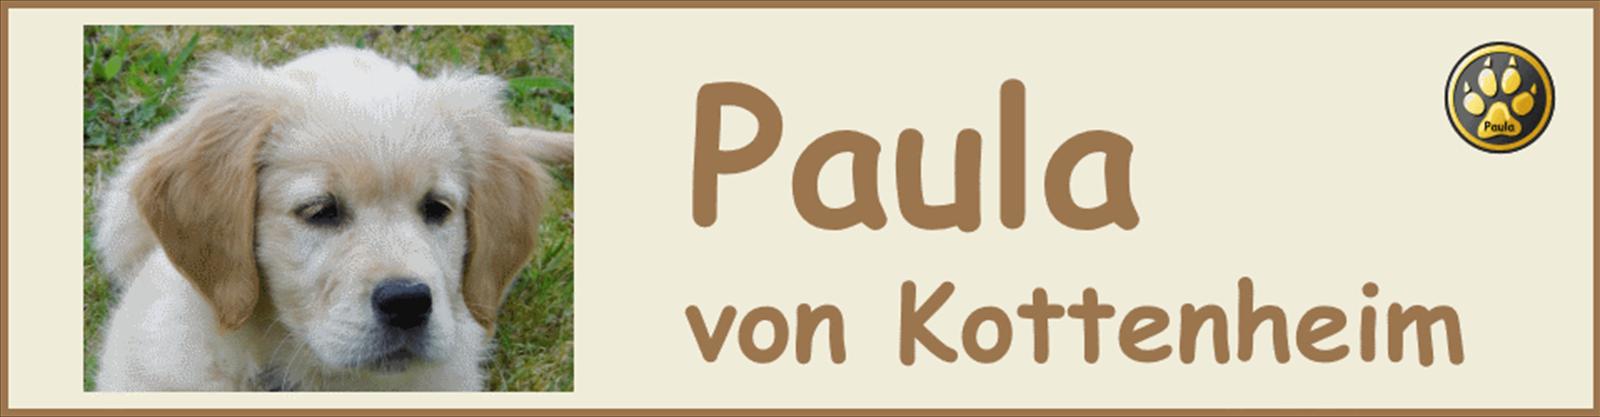 Paula-Banner-02